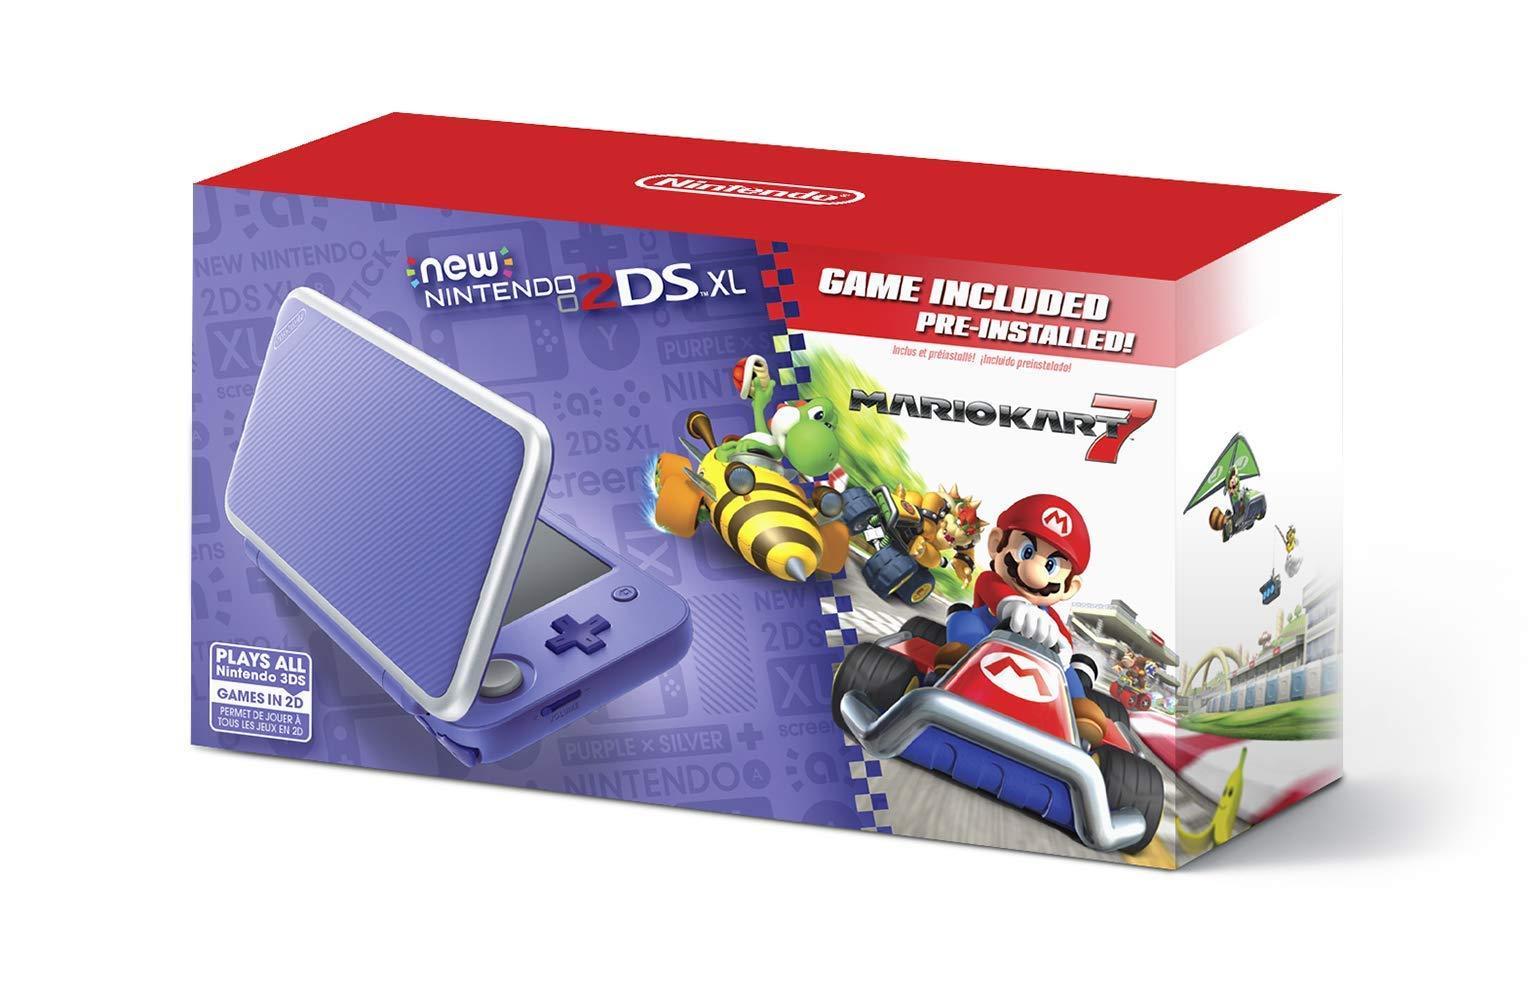 New Nintendo 2DS XL - Purple + Silver With Mario Kart 7 Pre-installed - Nintendo 2DS (Renewed)